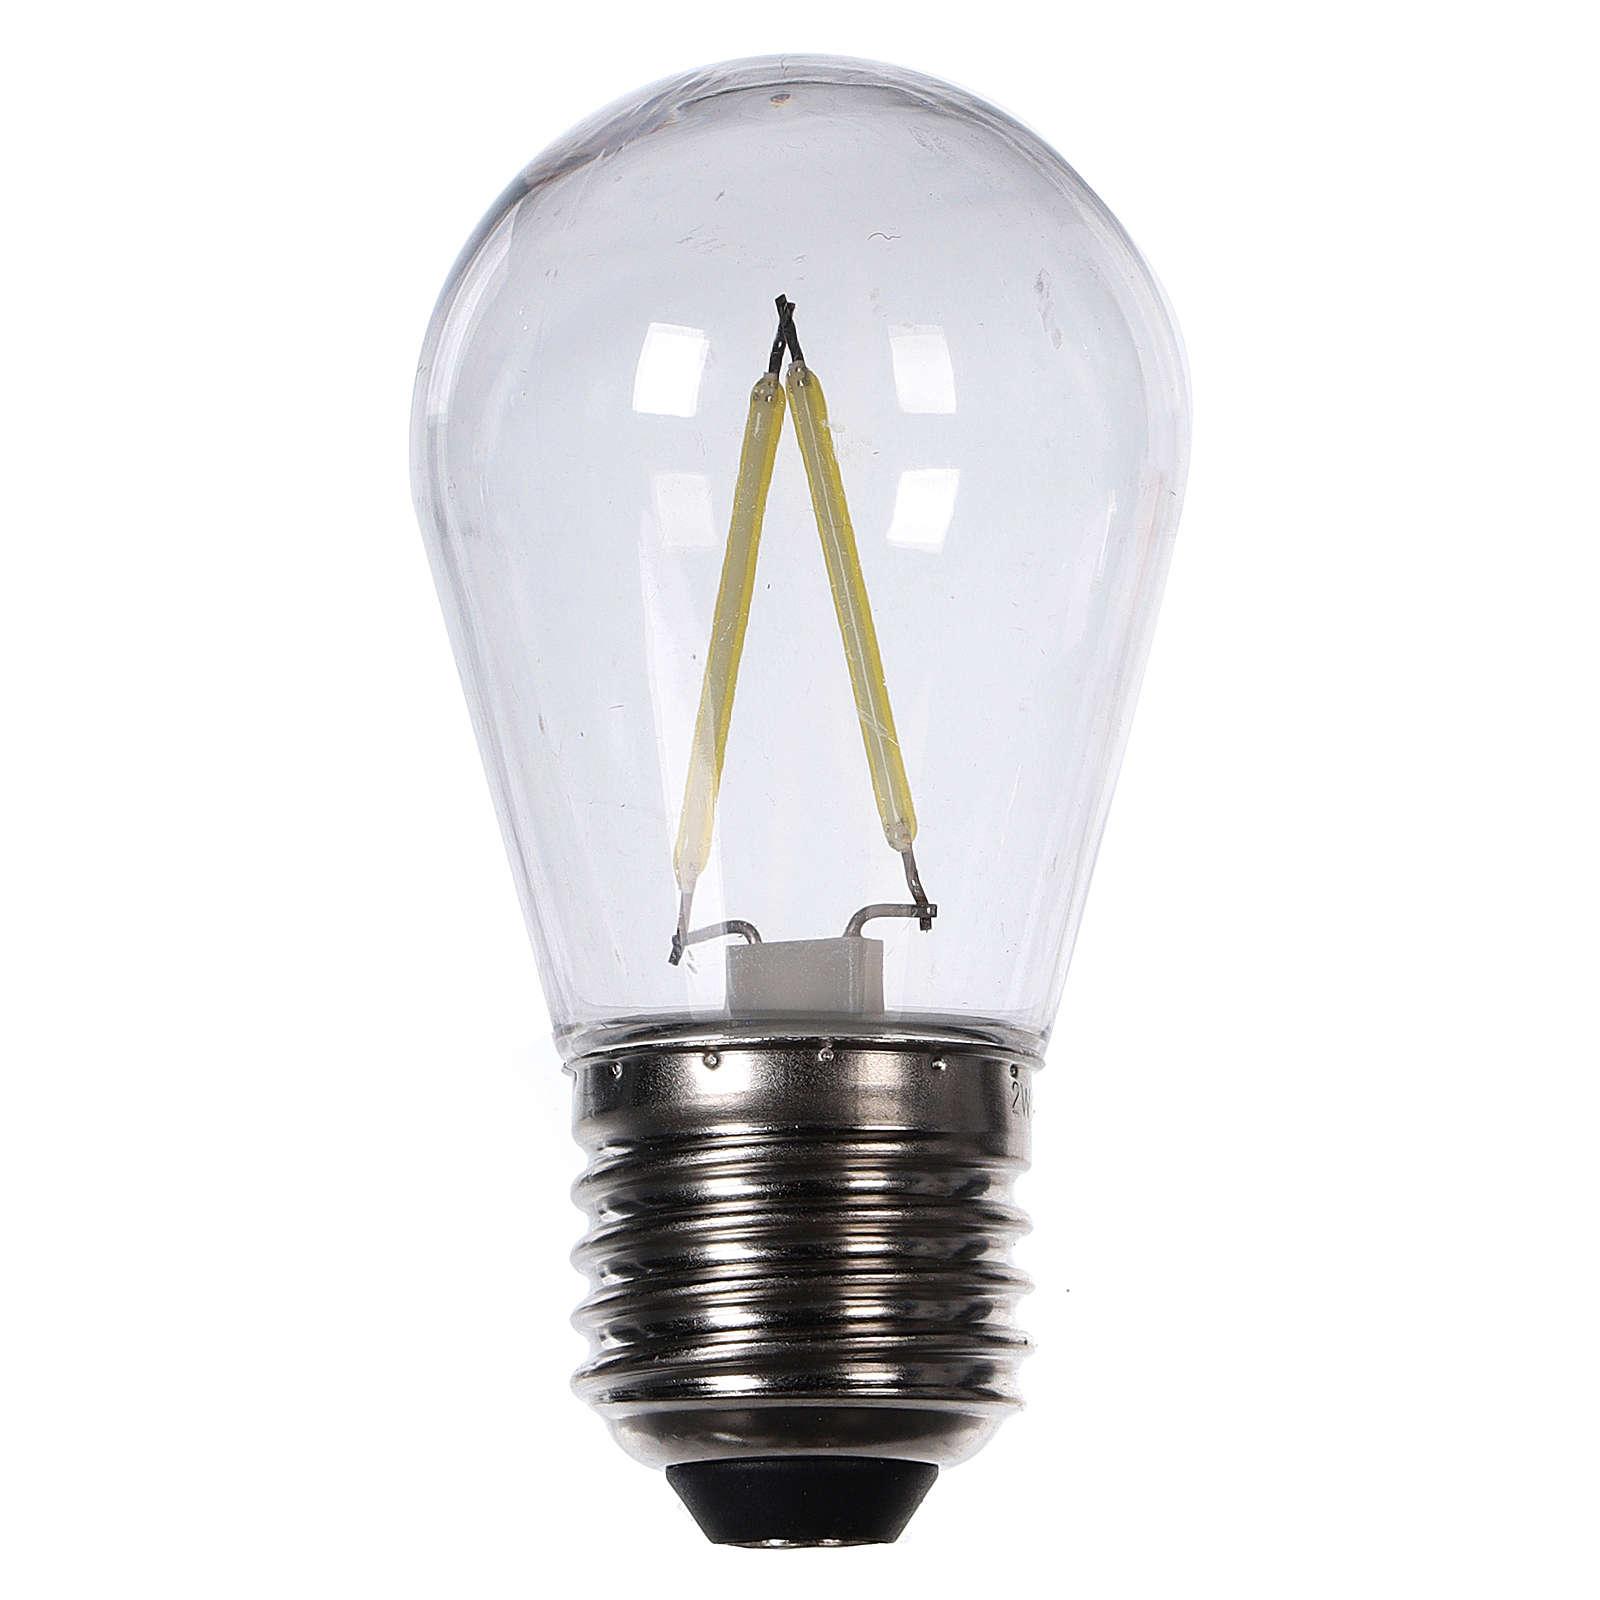 Lampadina goccia bianco 2W per cinture e catene luminose 3